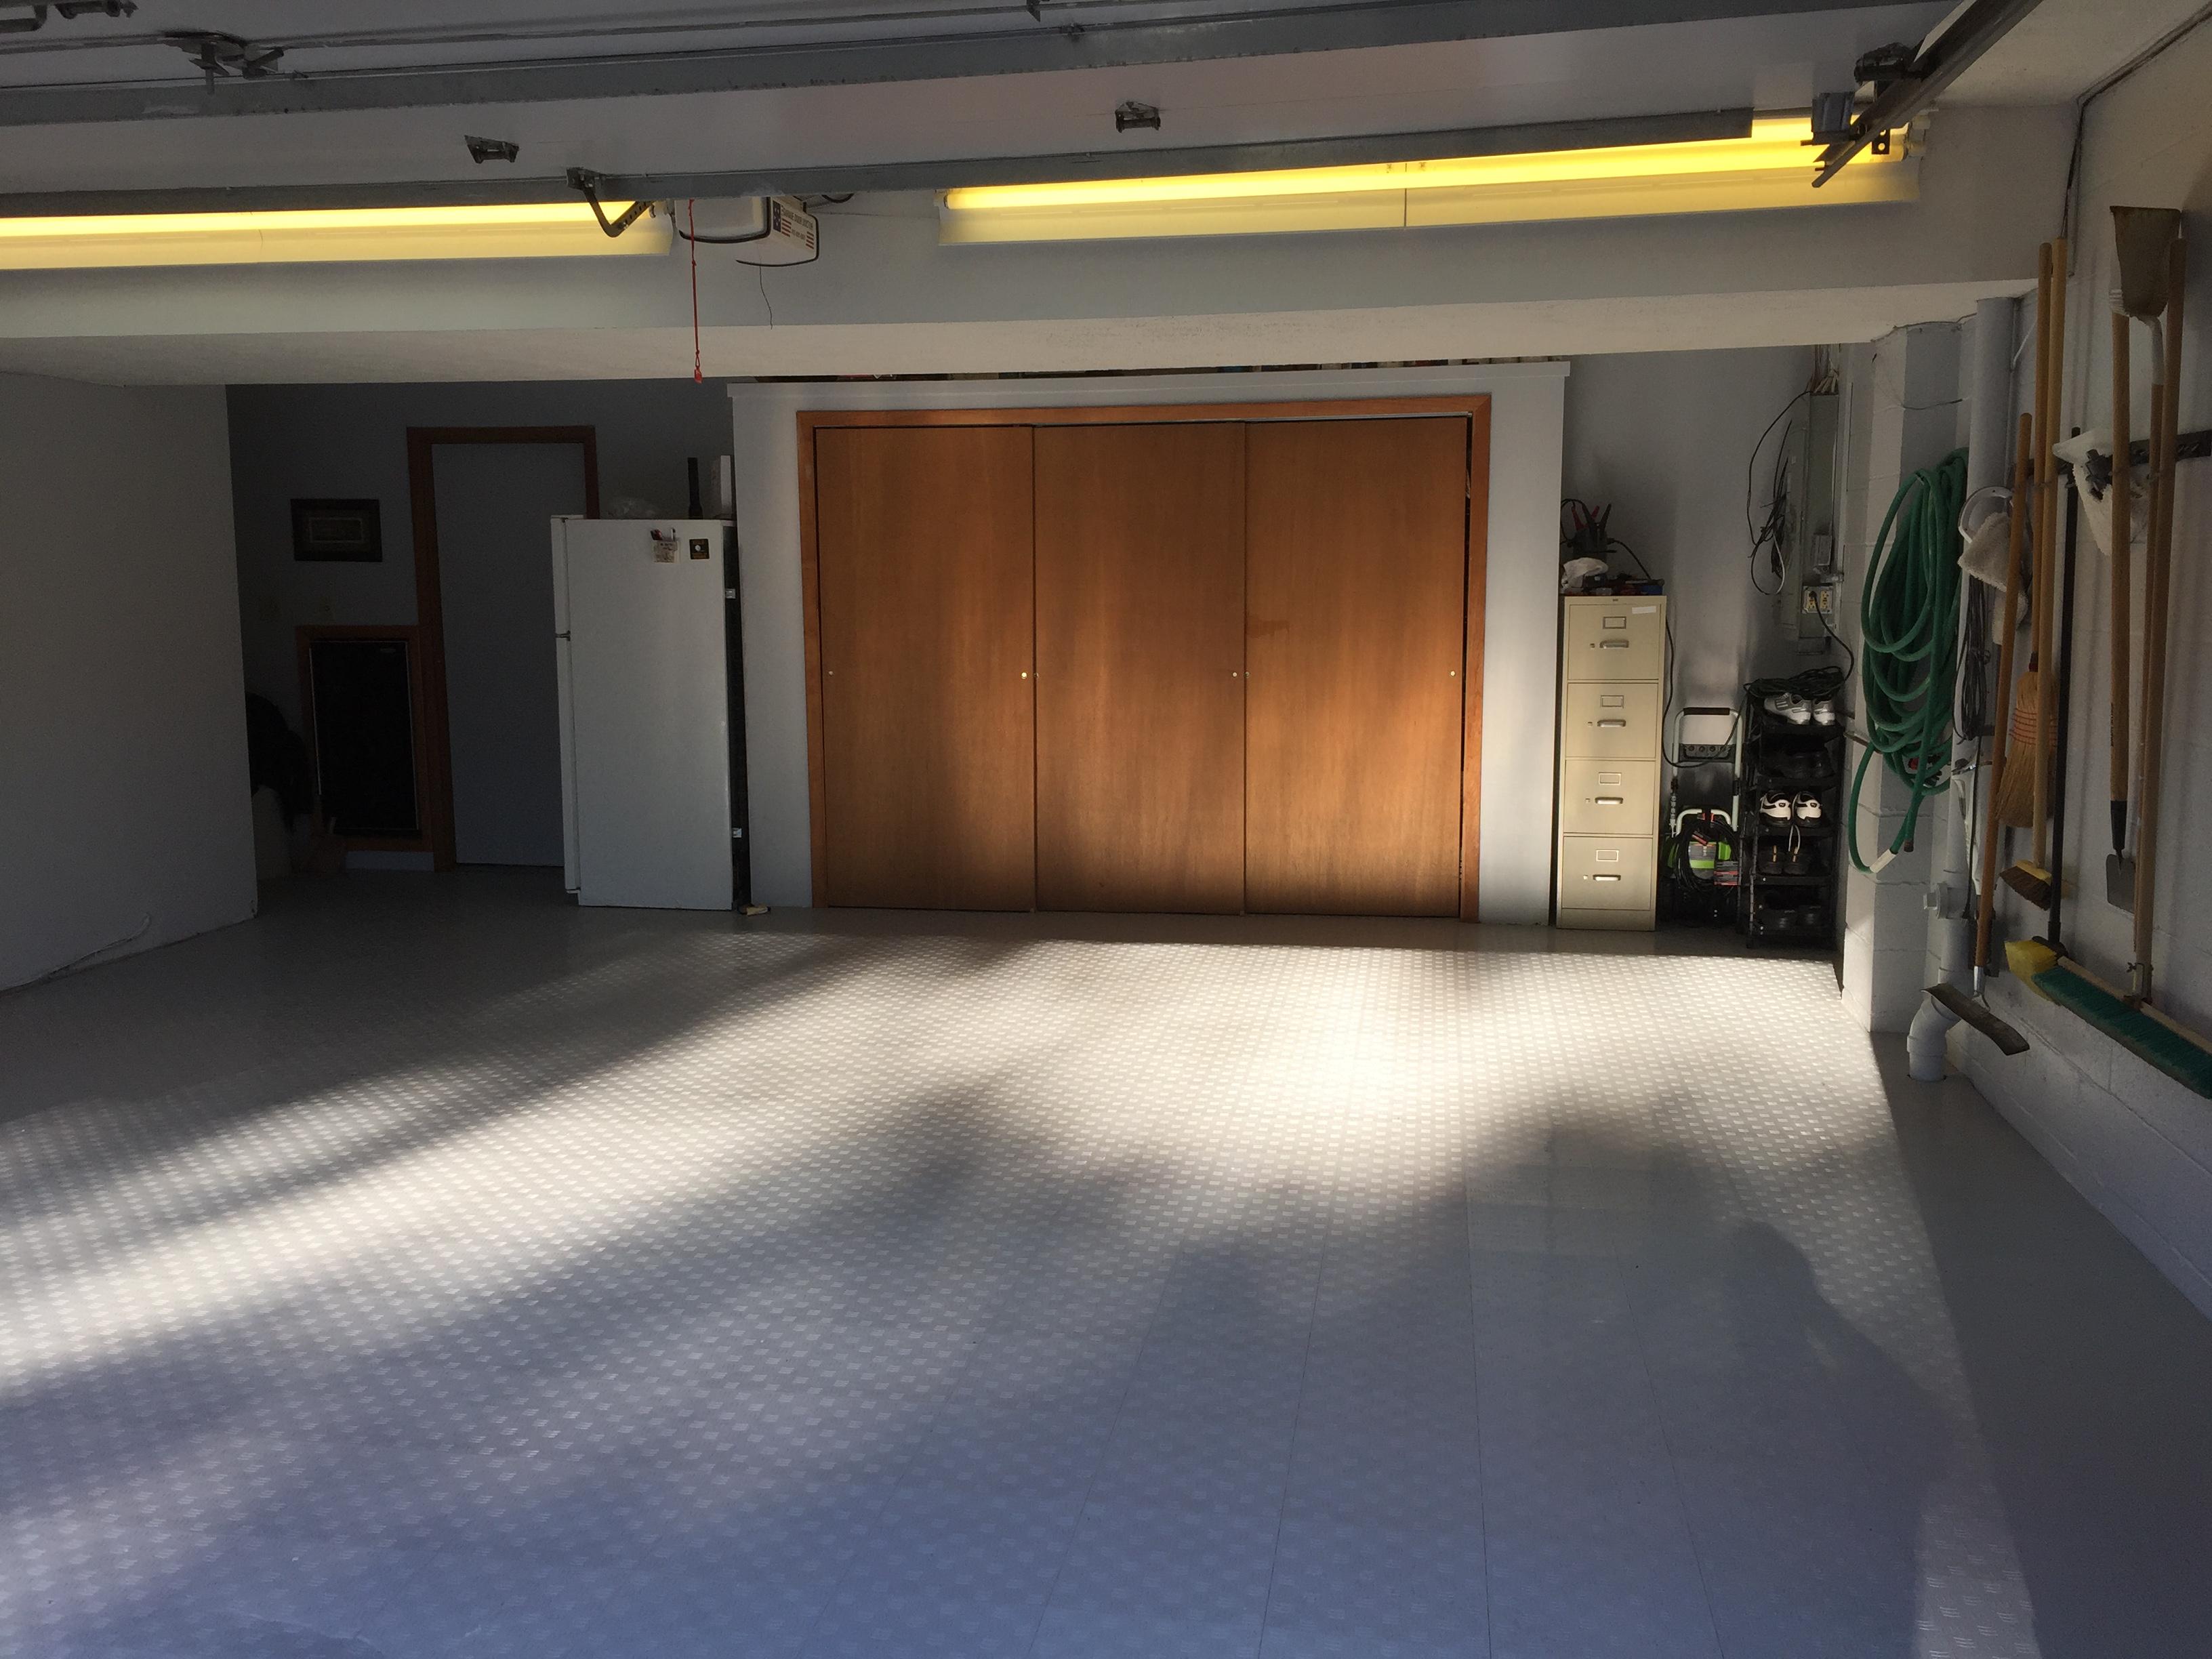 Raised Portable Garage Floor Tiles